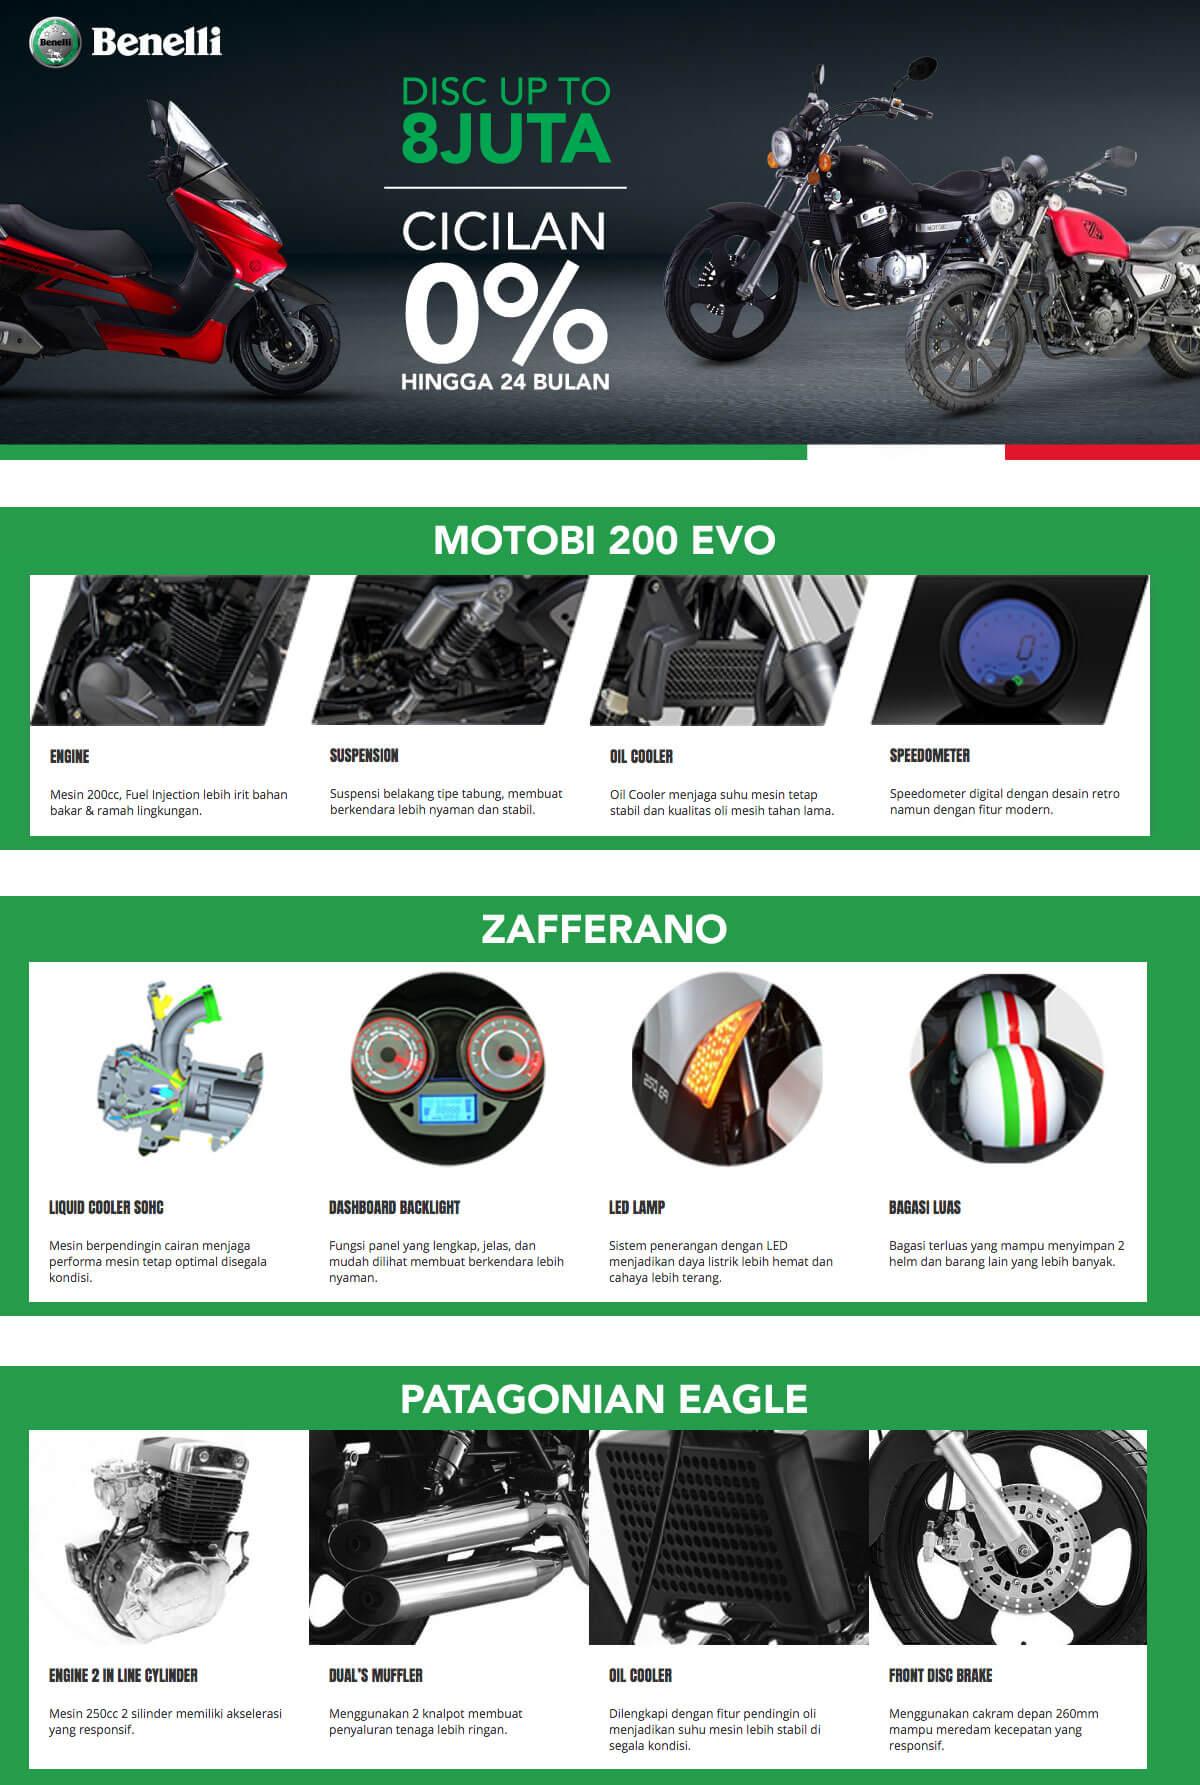 Kredit Benelli Motobi 200 Evo